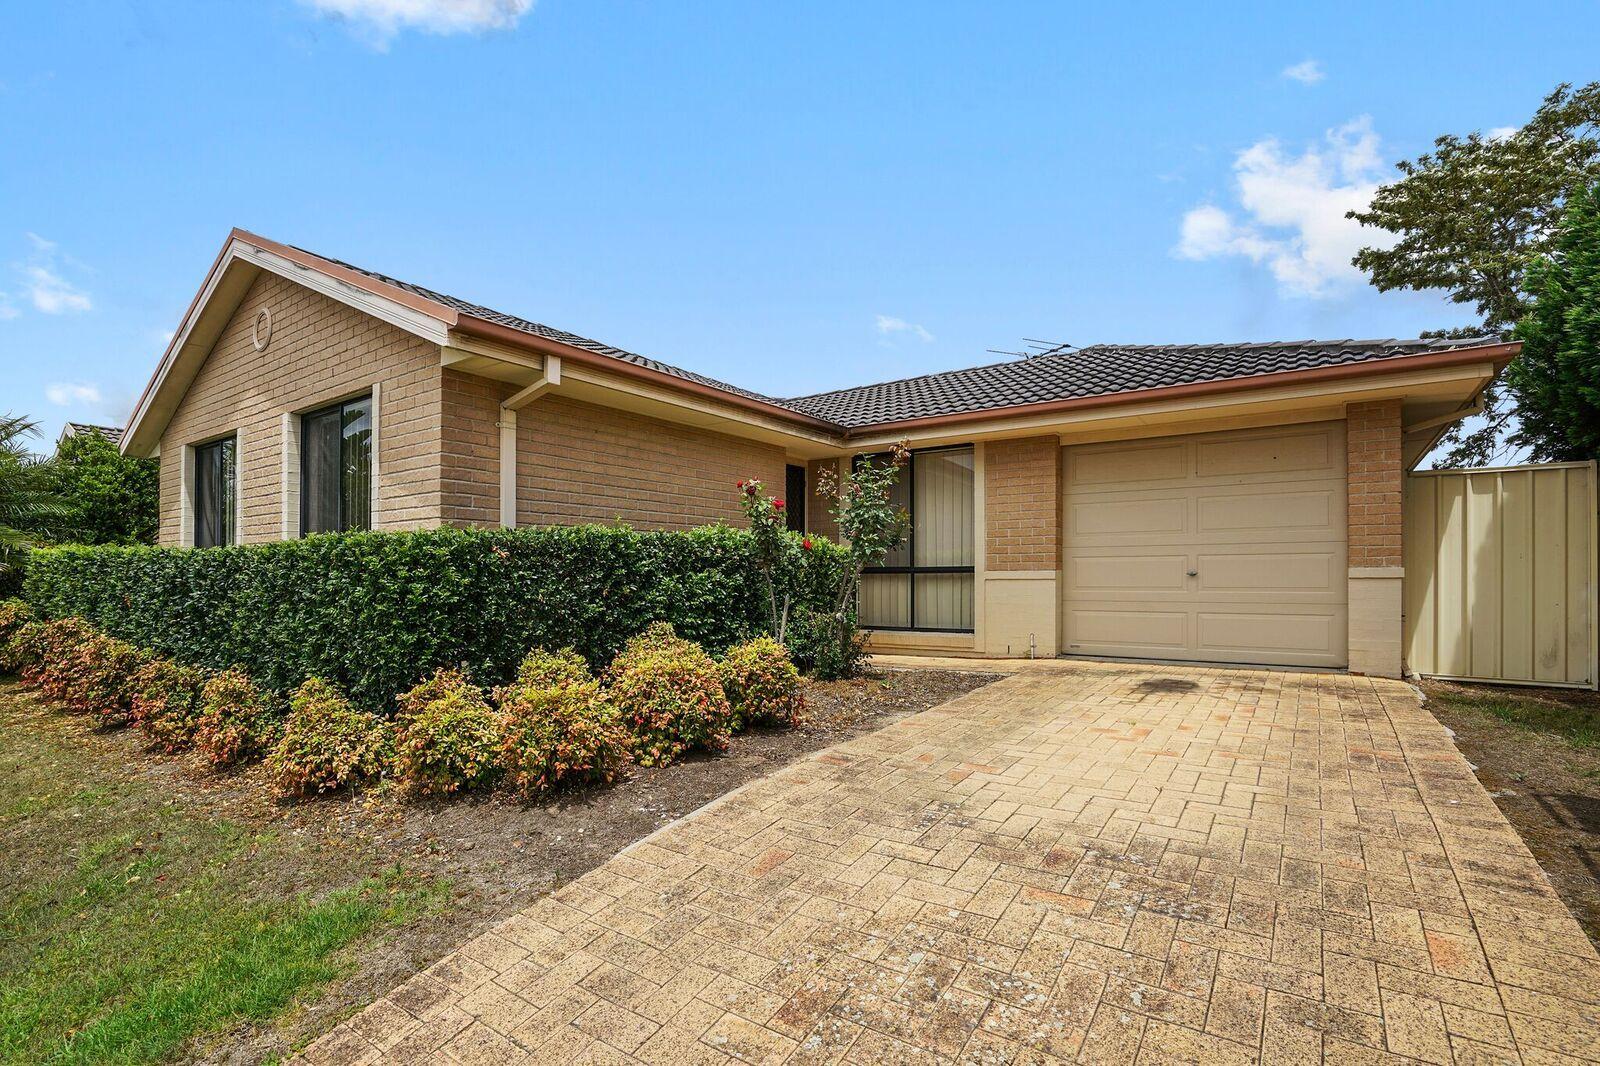 6 Bendtree Cove, Thornton NSW 2322, Image 0